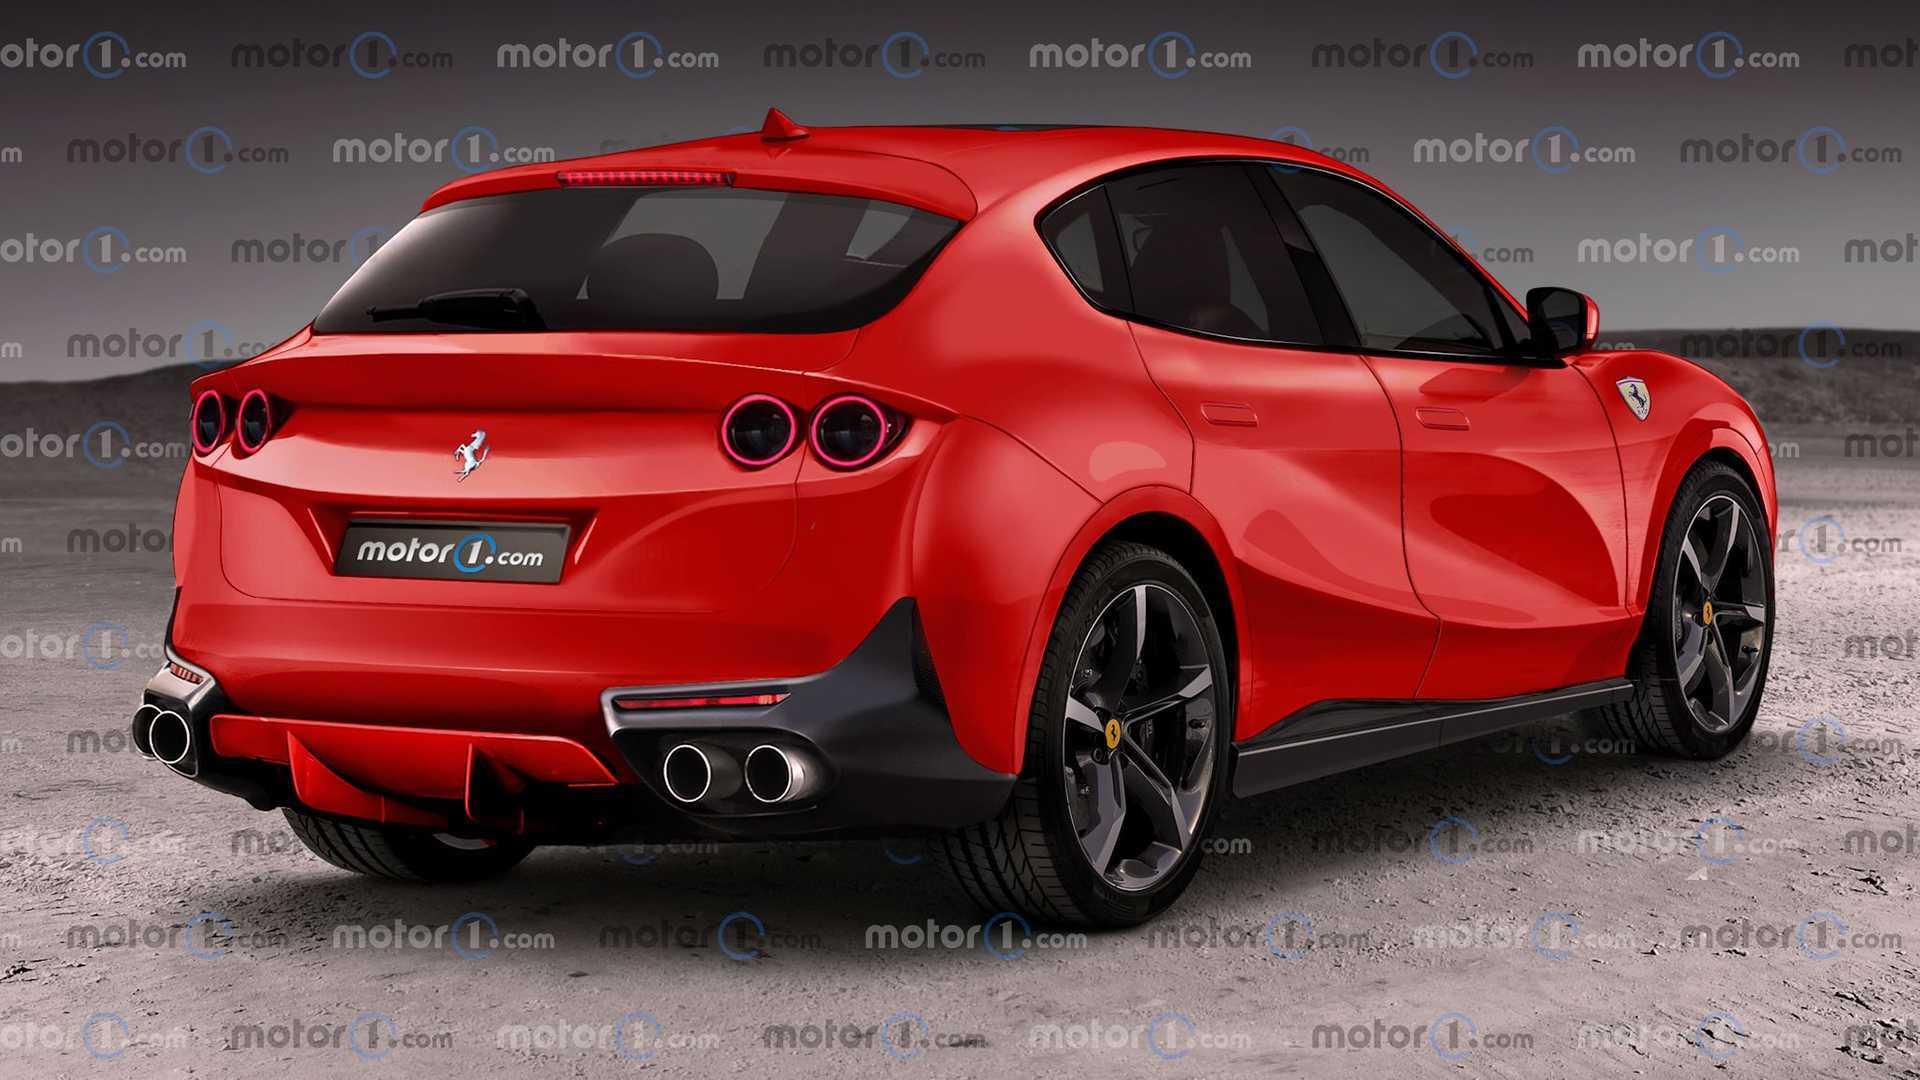 Ferrari Purosangue So Könnte Das Suv Von Ferrari Aussehen